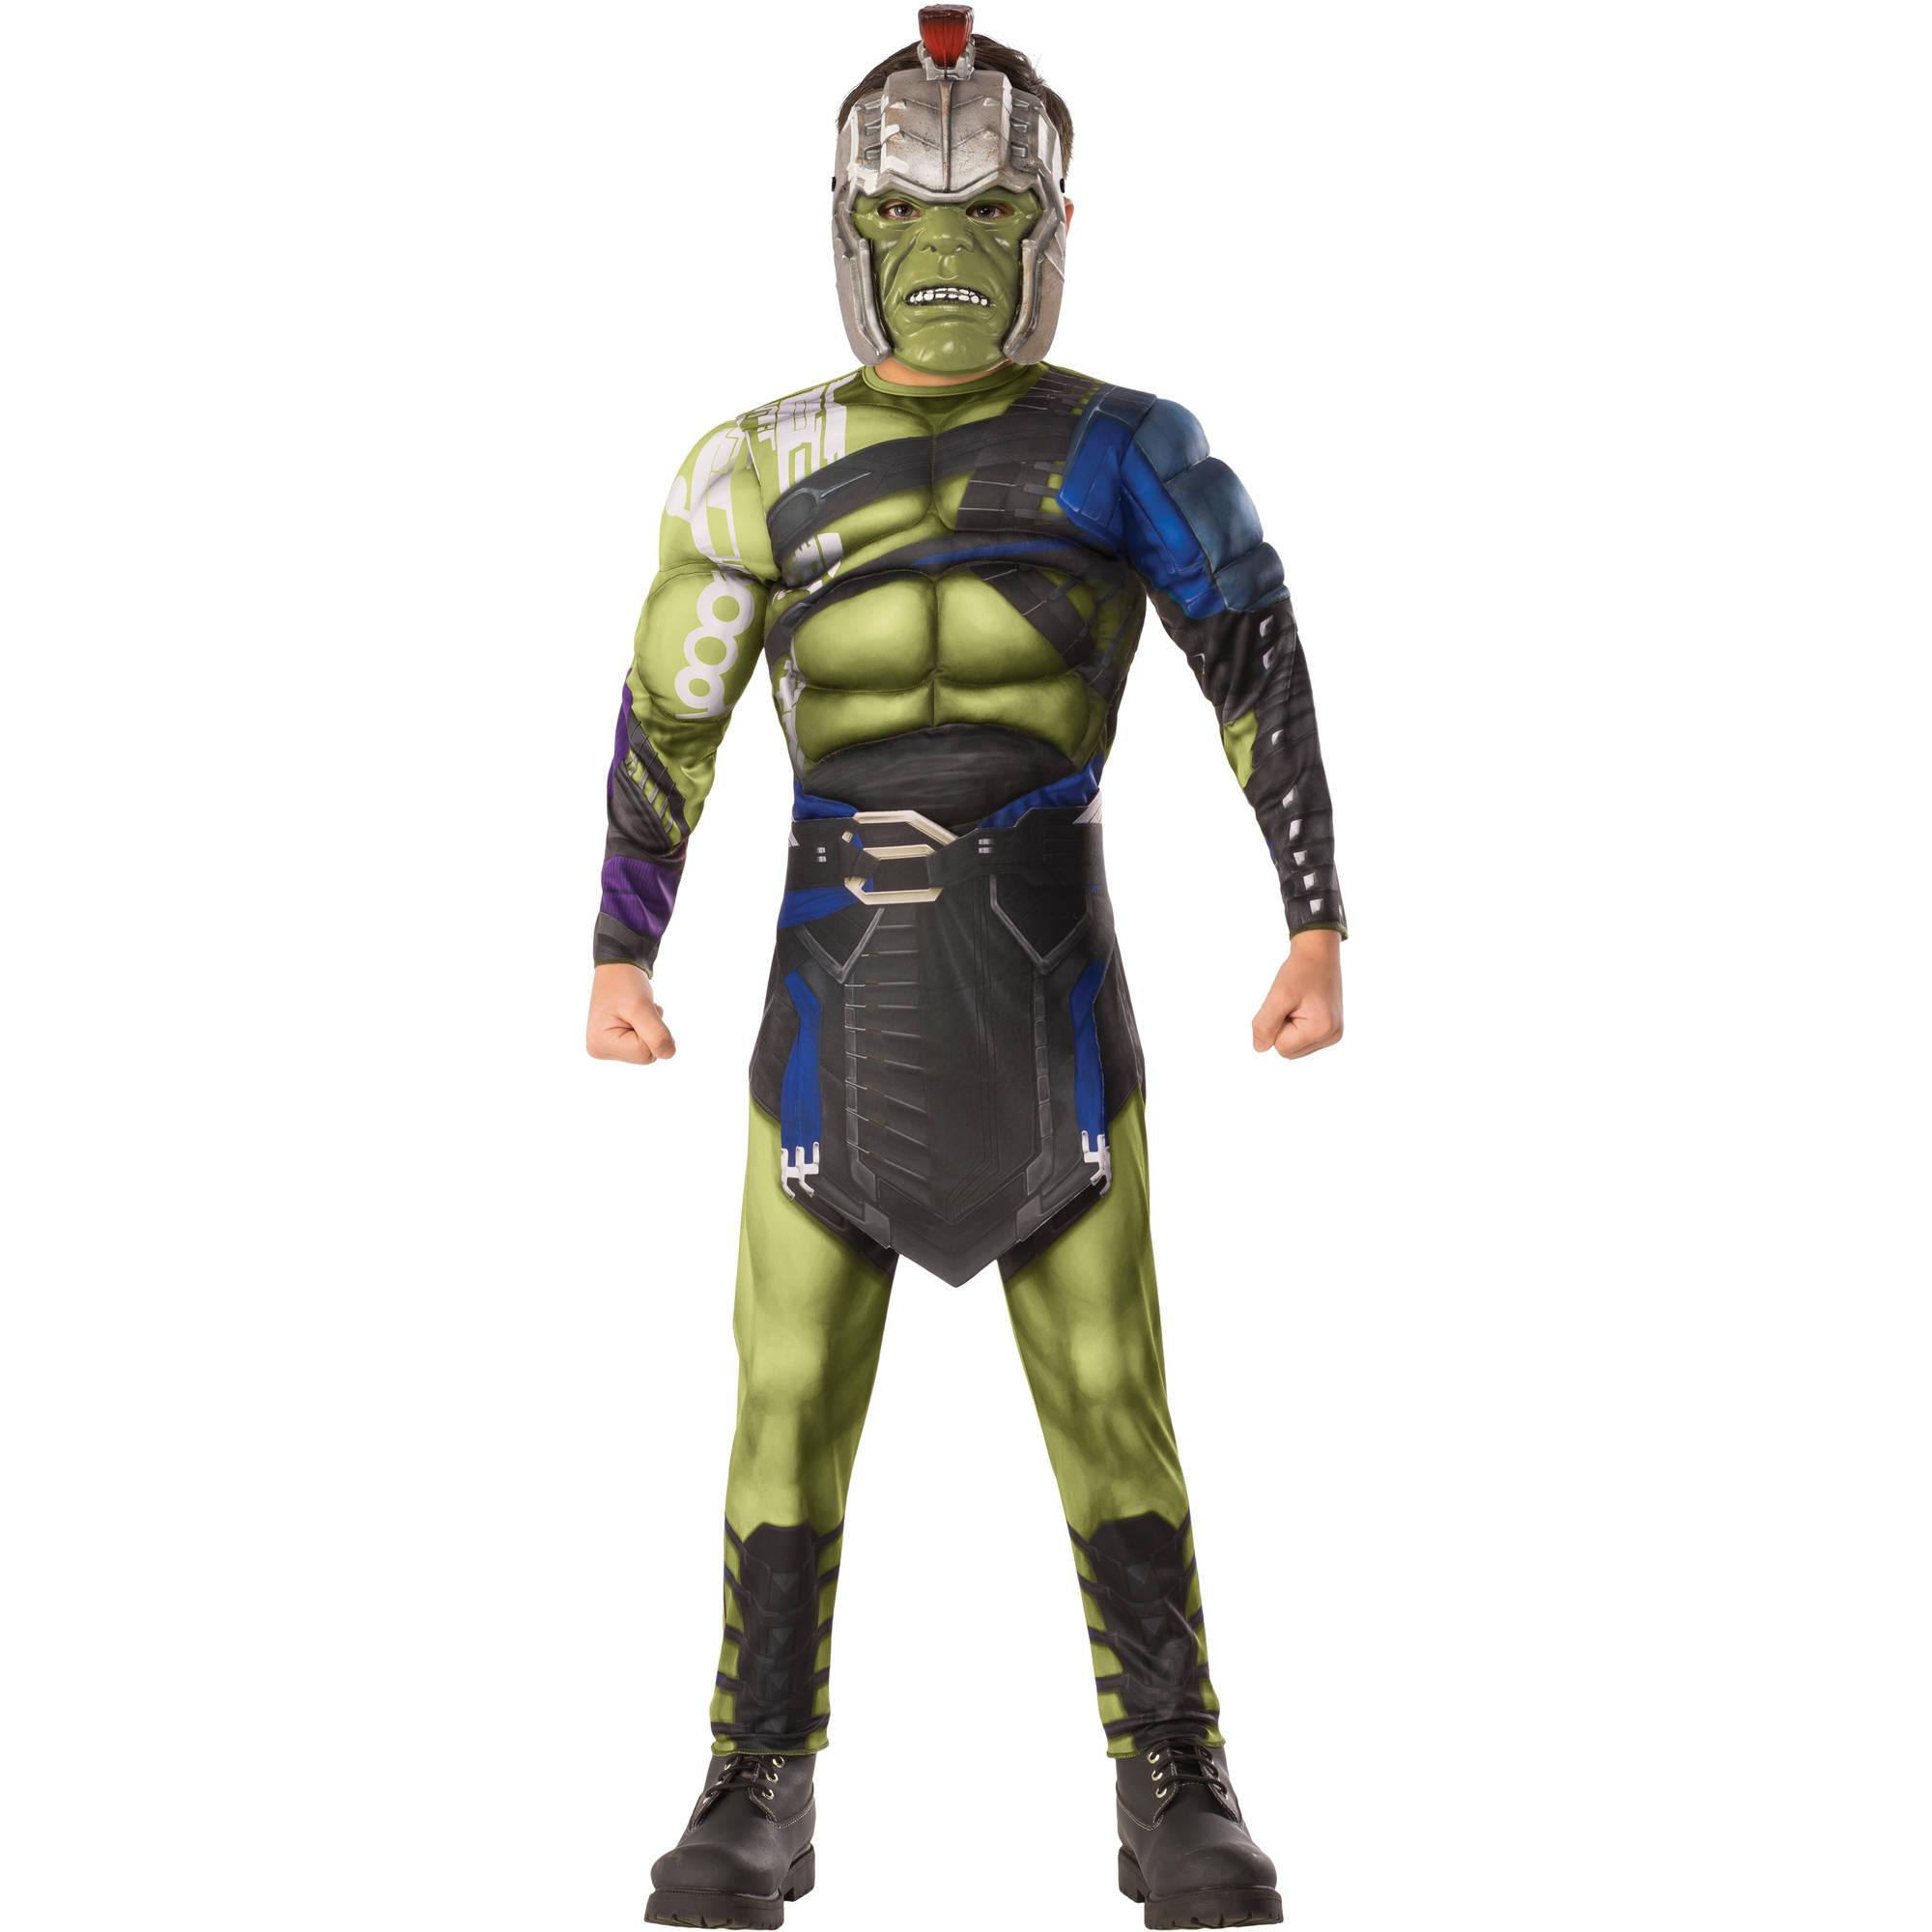 Thor: Ragnarok Hulk Child's Costume, Small (4-6)